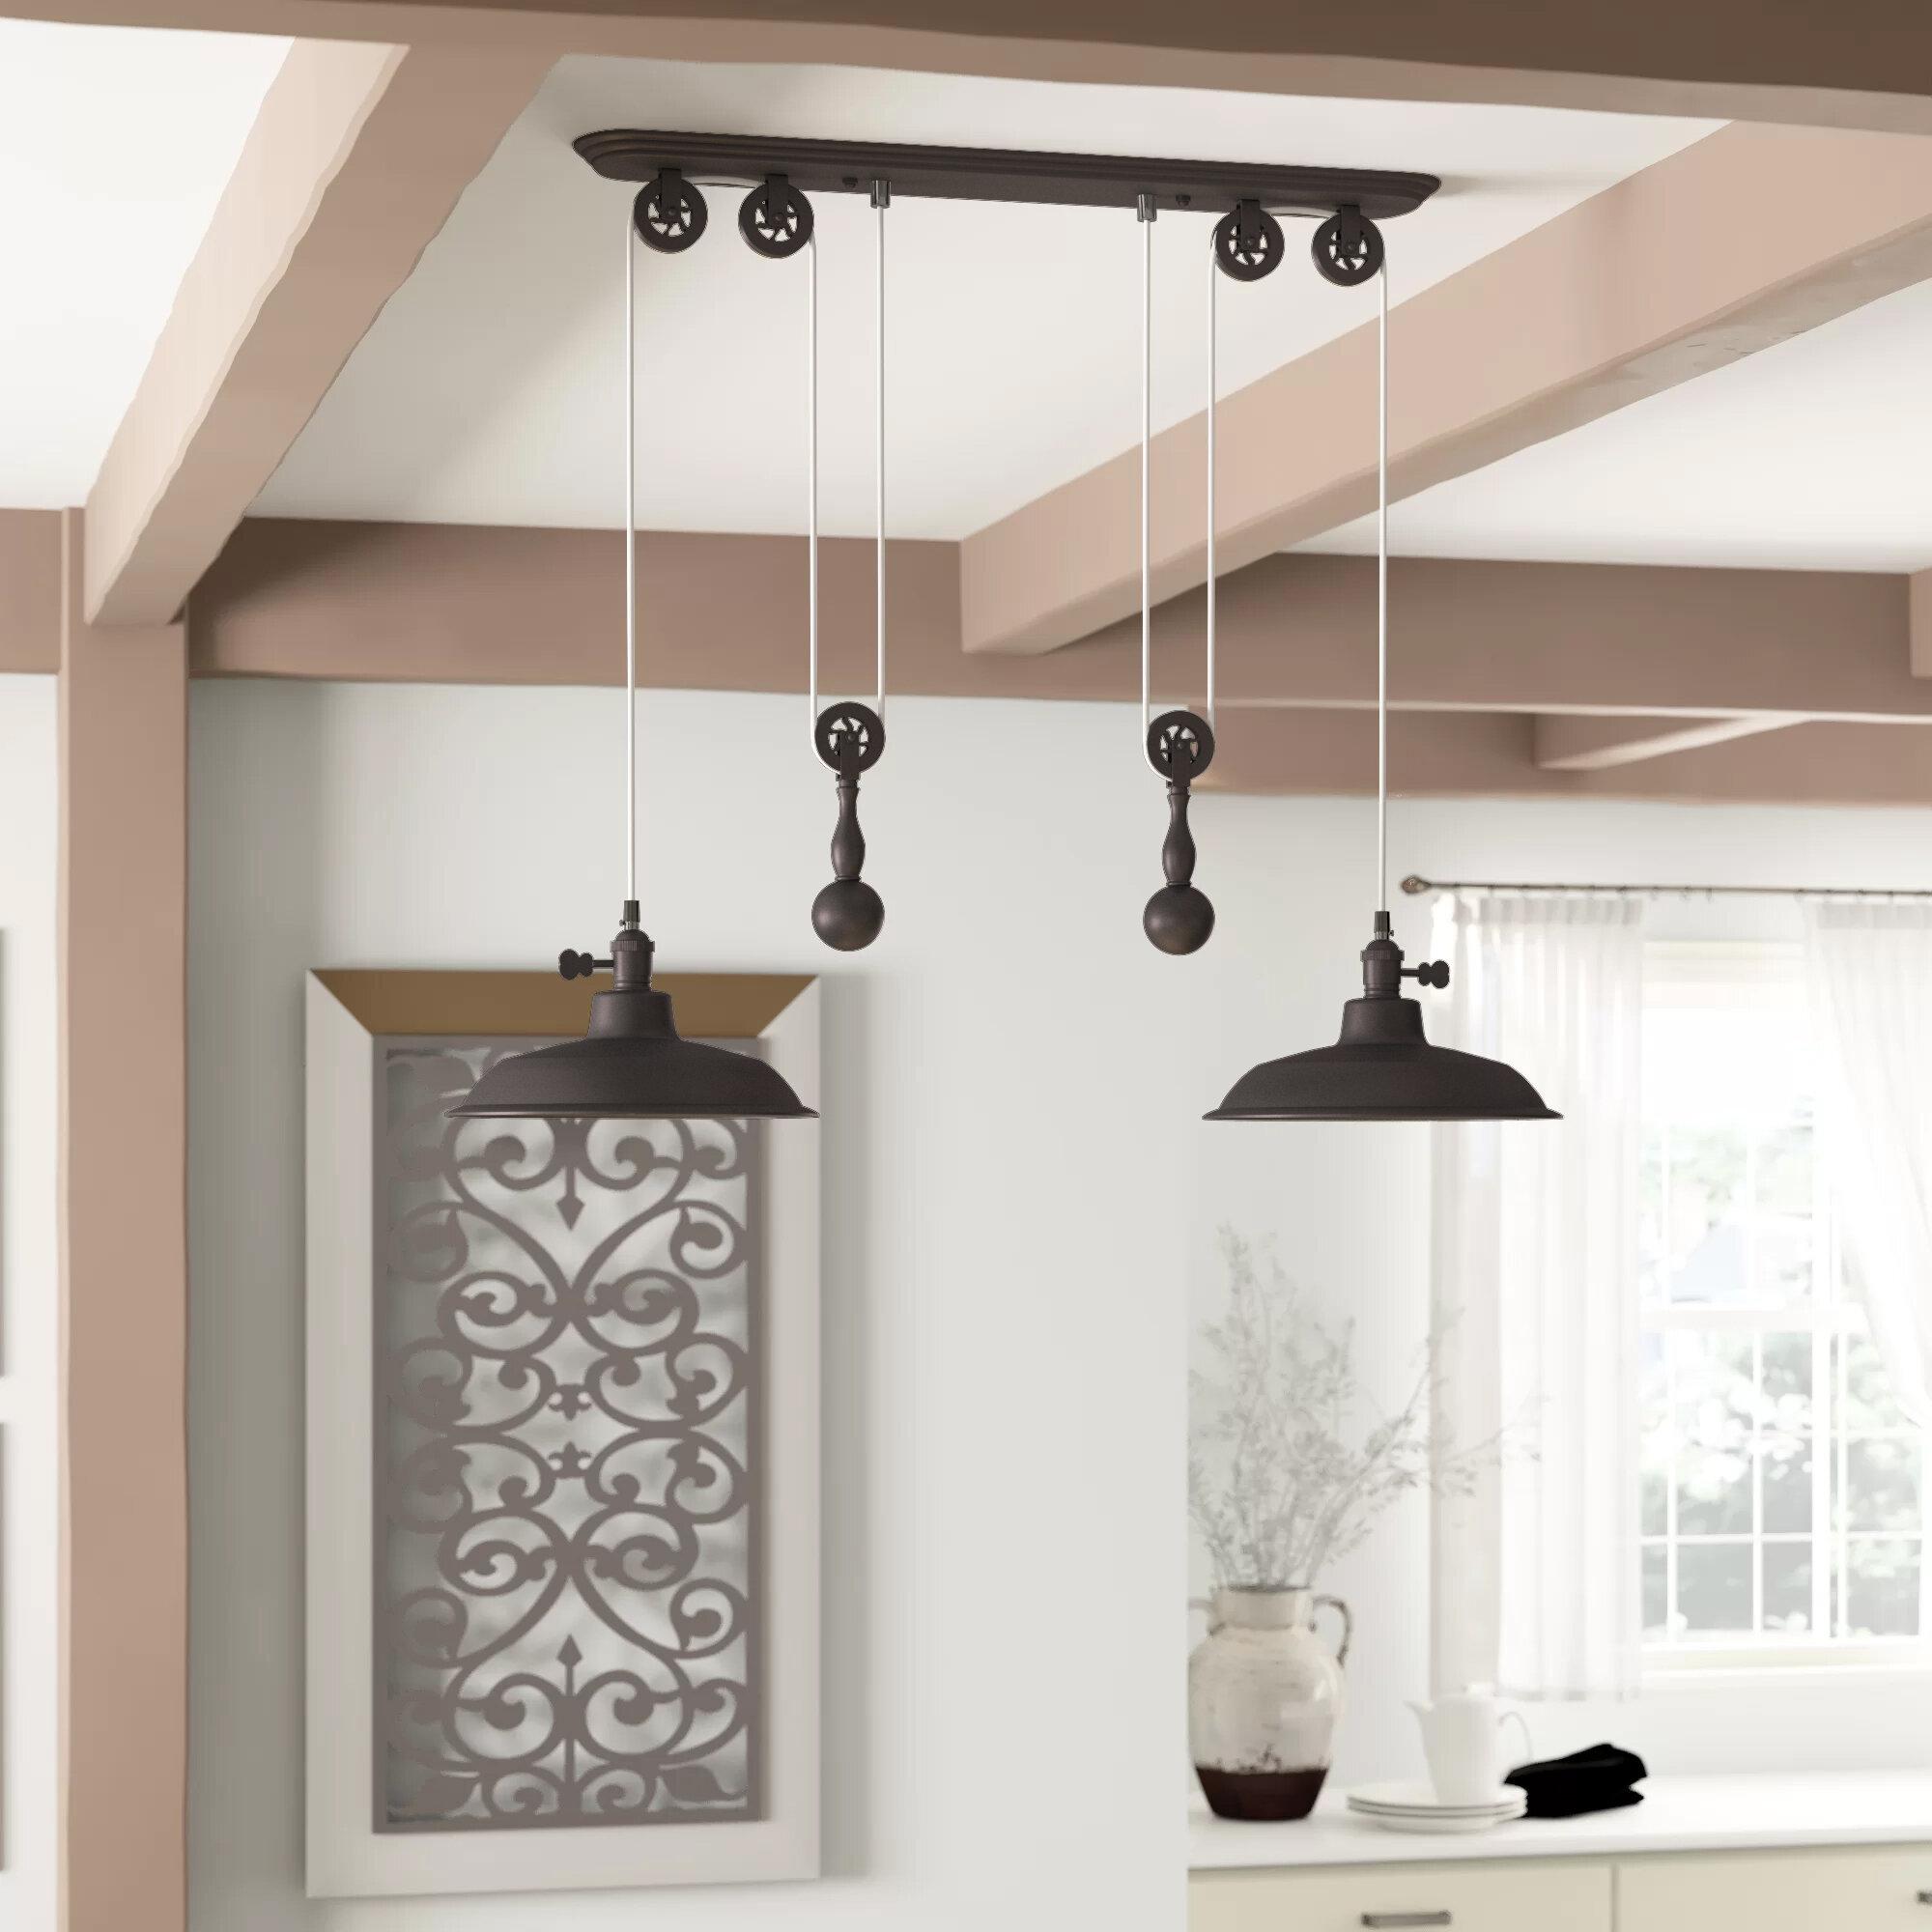 Farmhouse & Rustic Trent Austin Design Pendants | Birch Lane Intended For Irwin 1 Light Single Globe Pendants (View 9 of 30)